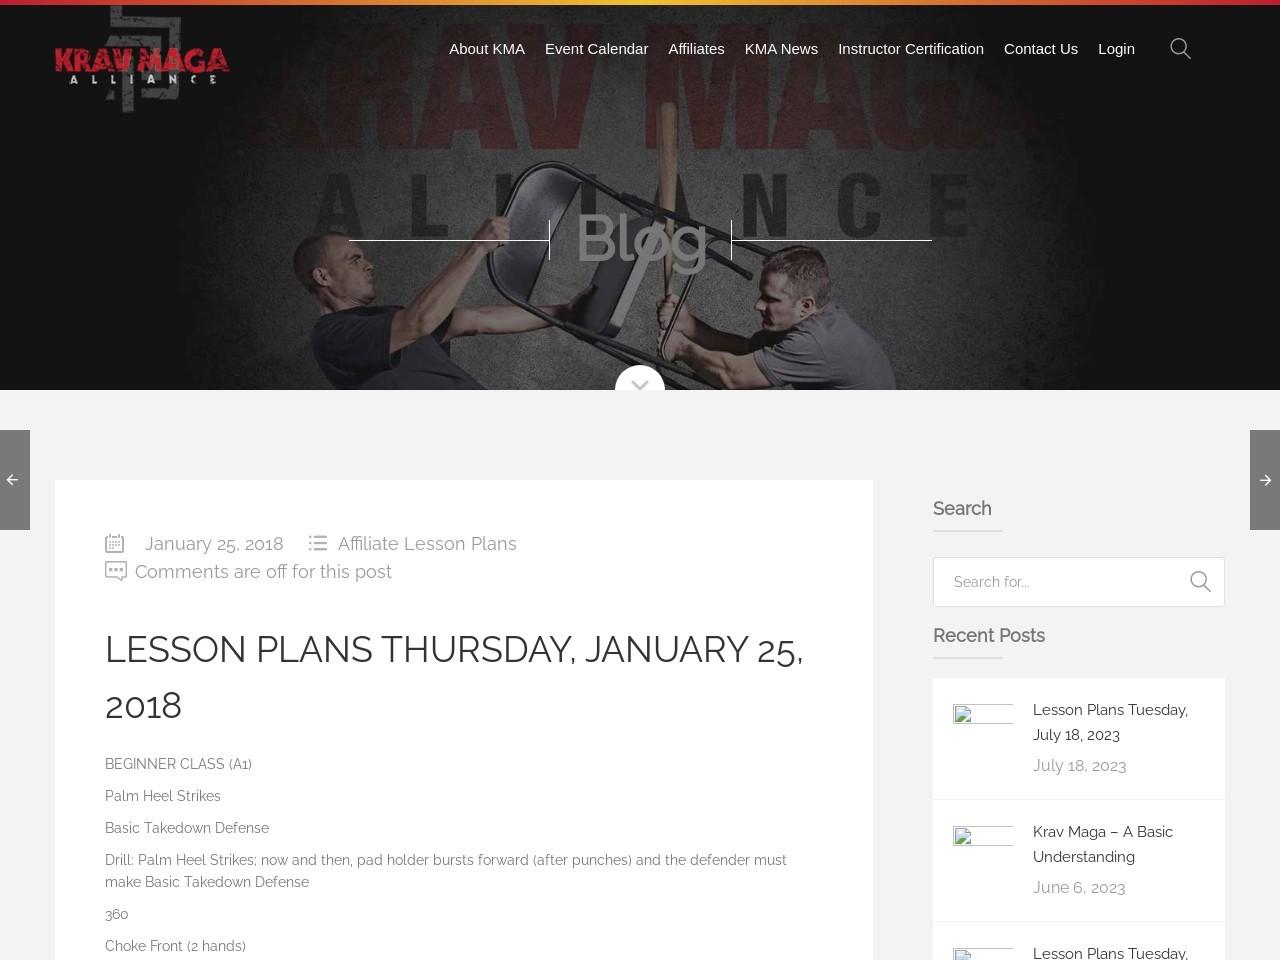 Lesson Plans Thursday, January 25, 2018